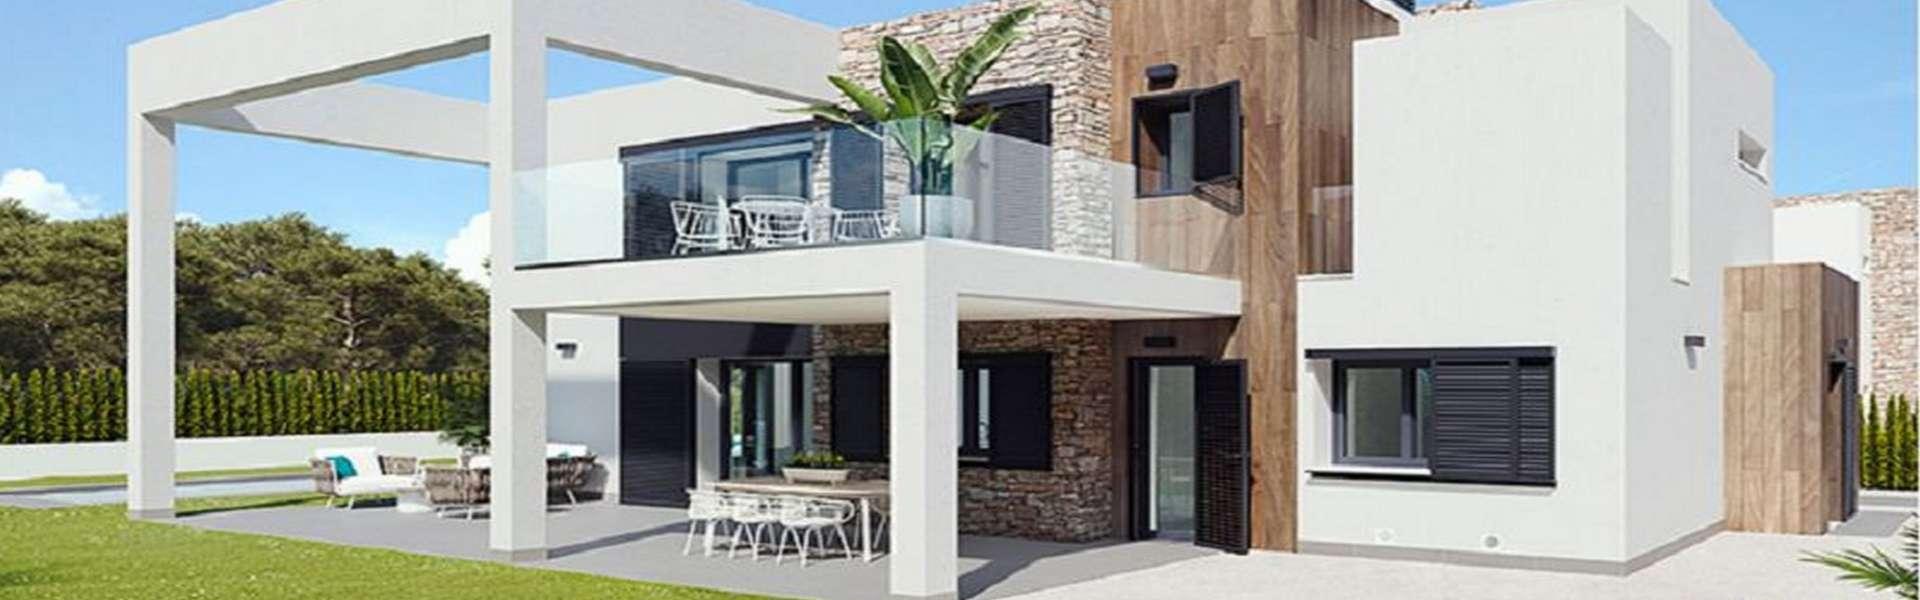 Cala Murada - New built villa in top location